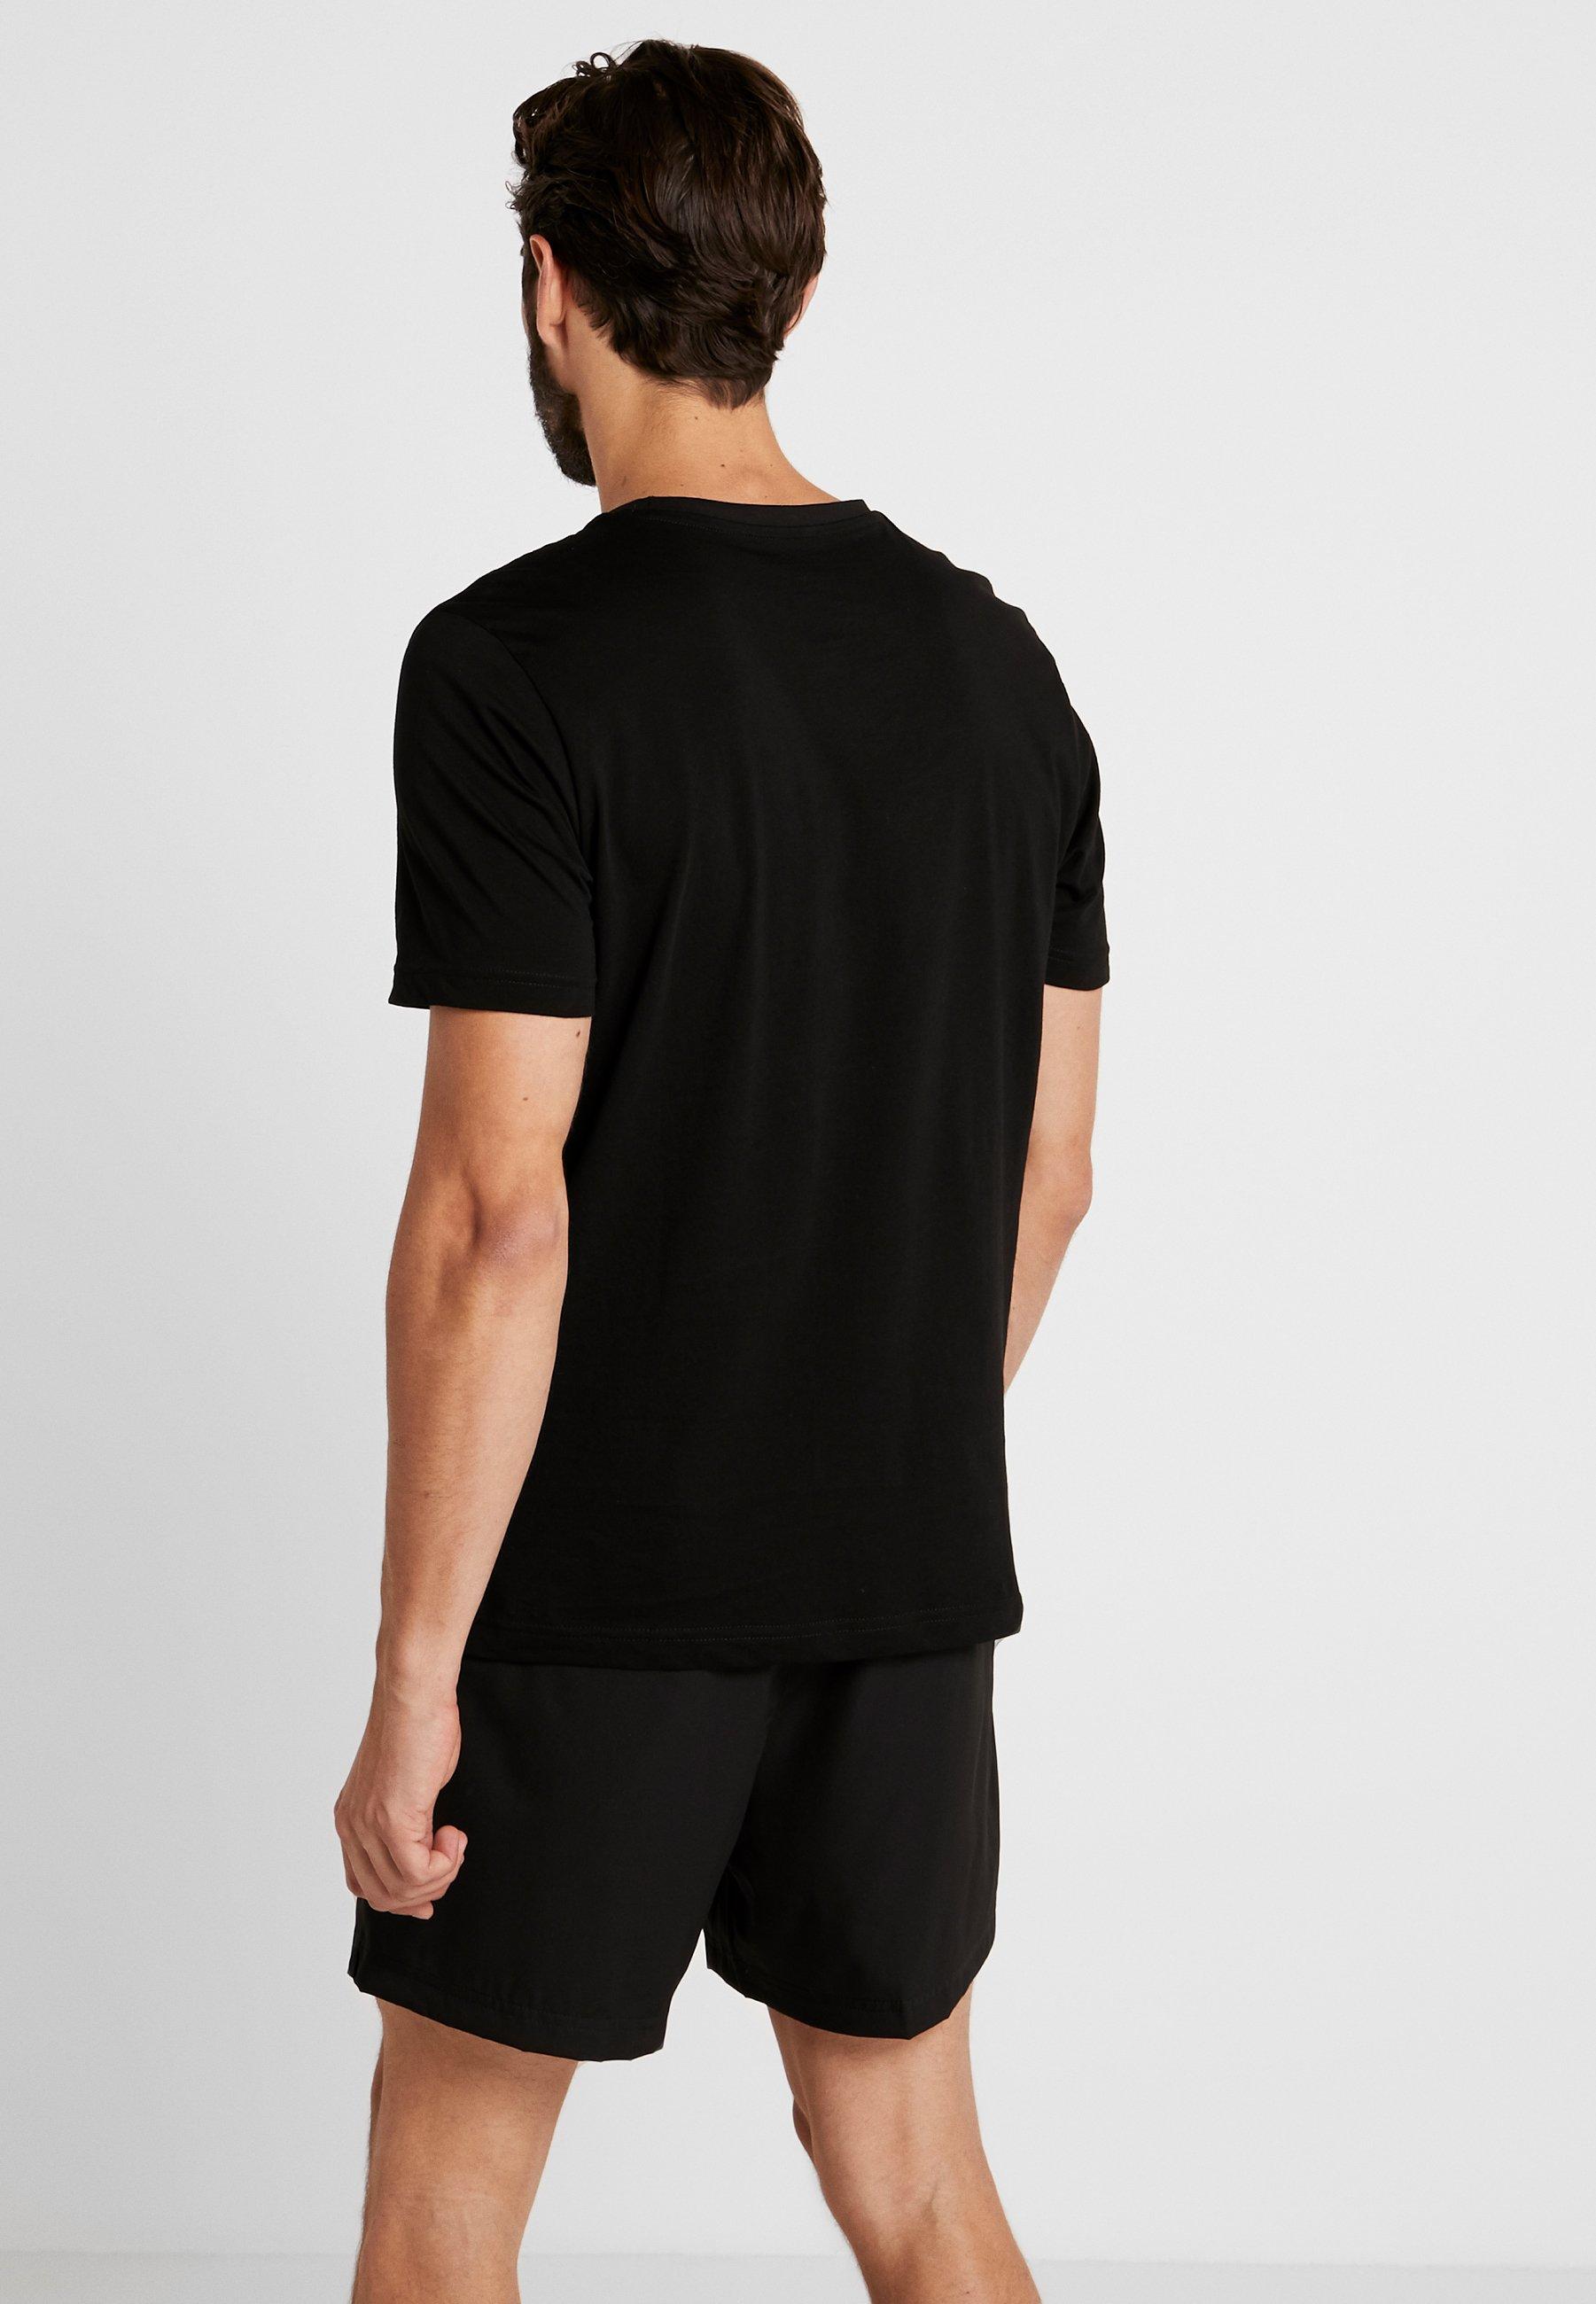 TeeT Rebel shirt Black Puma Camofilled Imprimé FJlKcT13